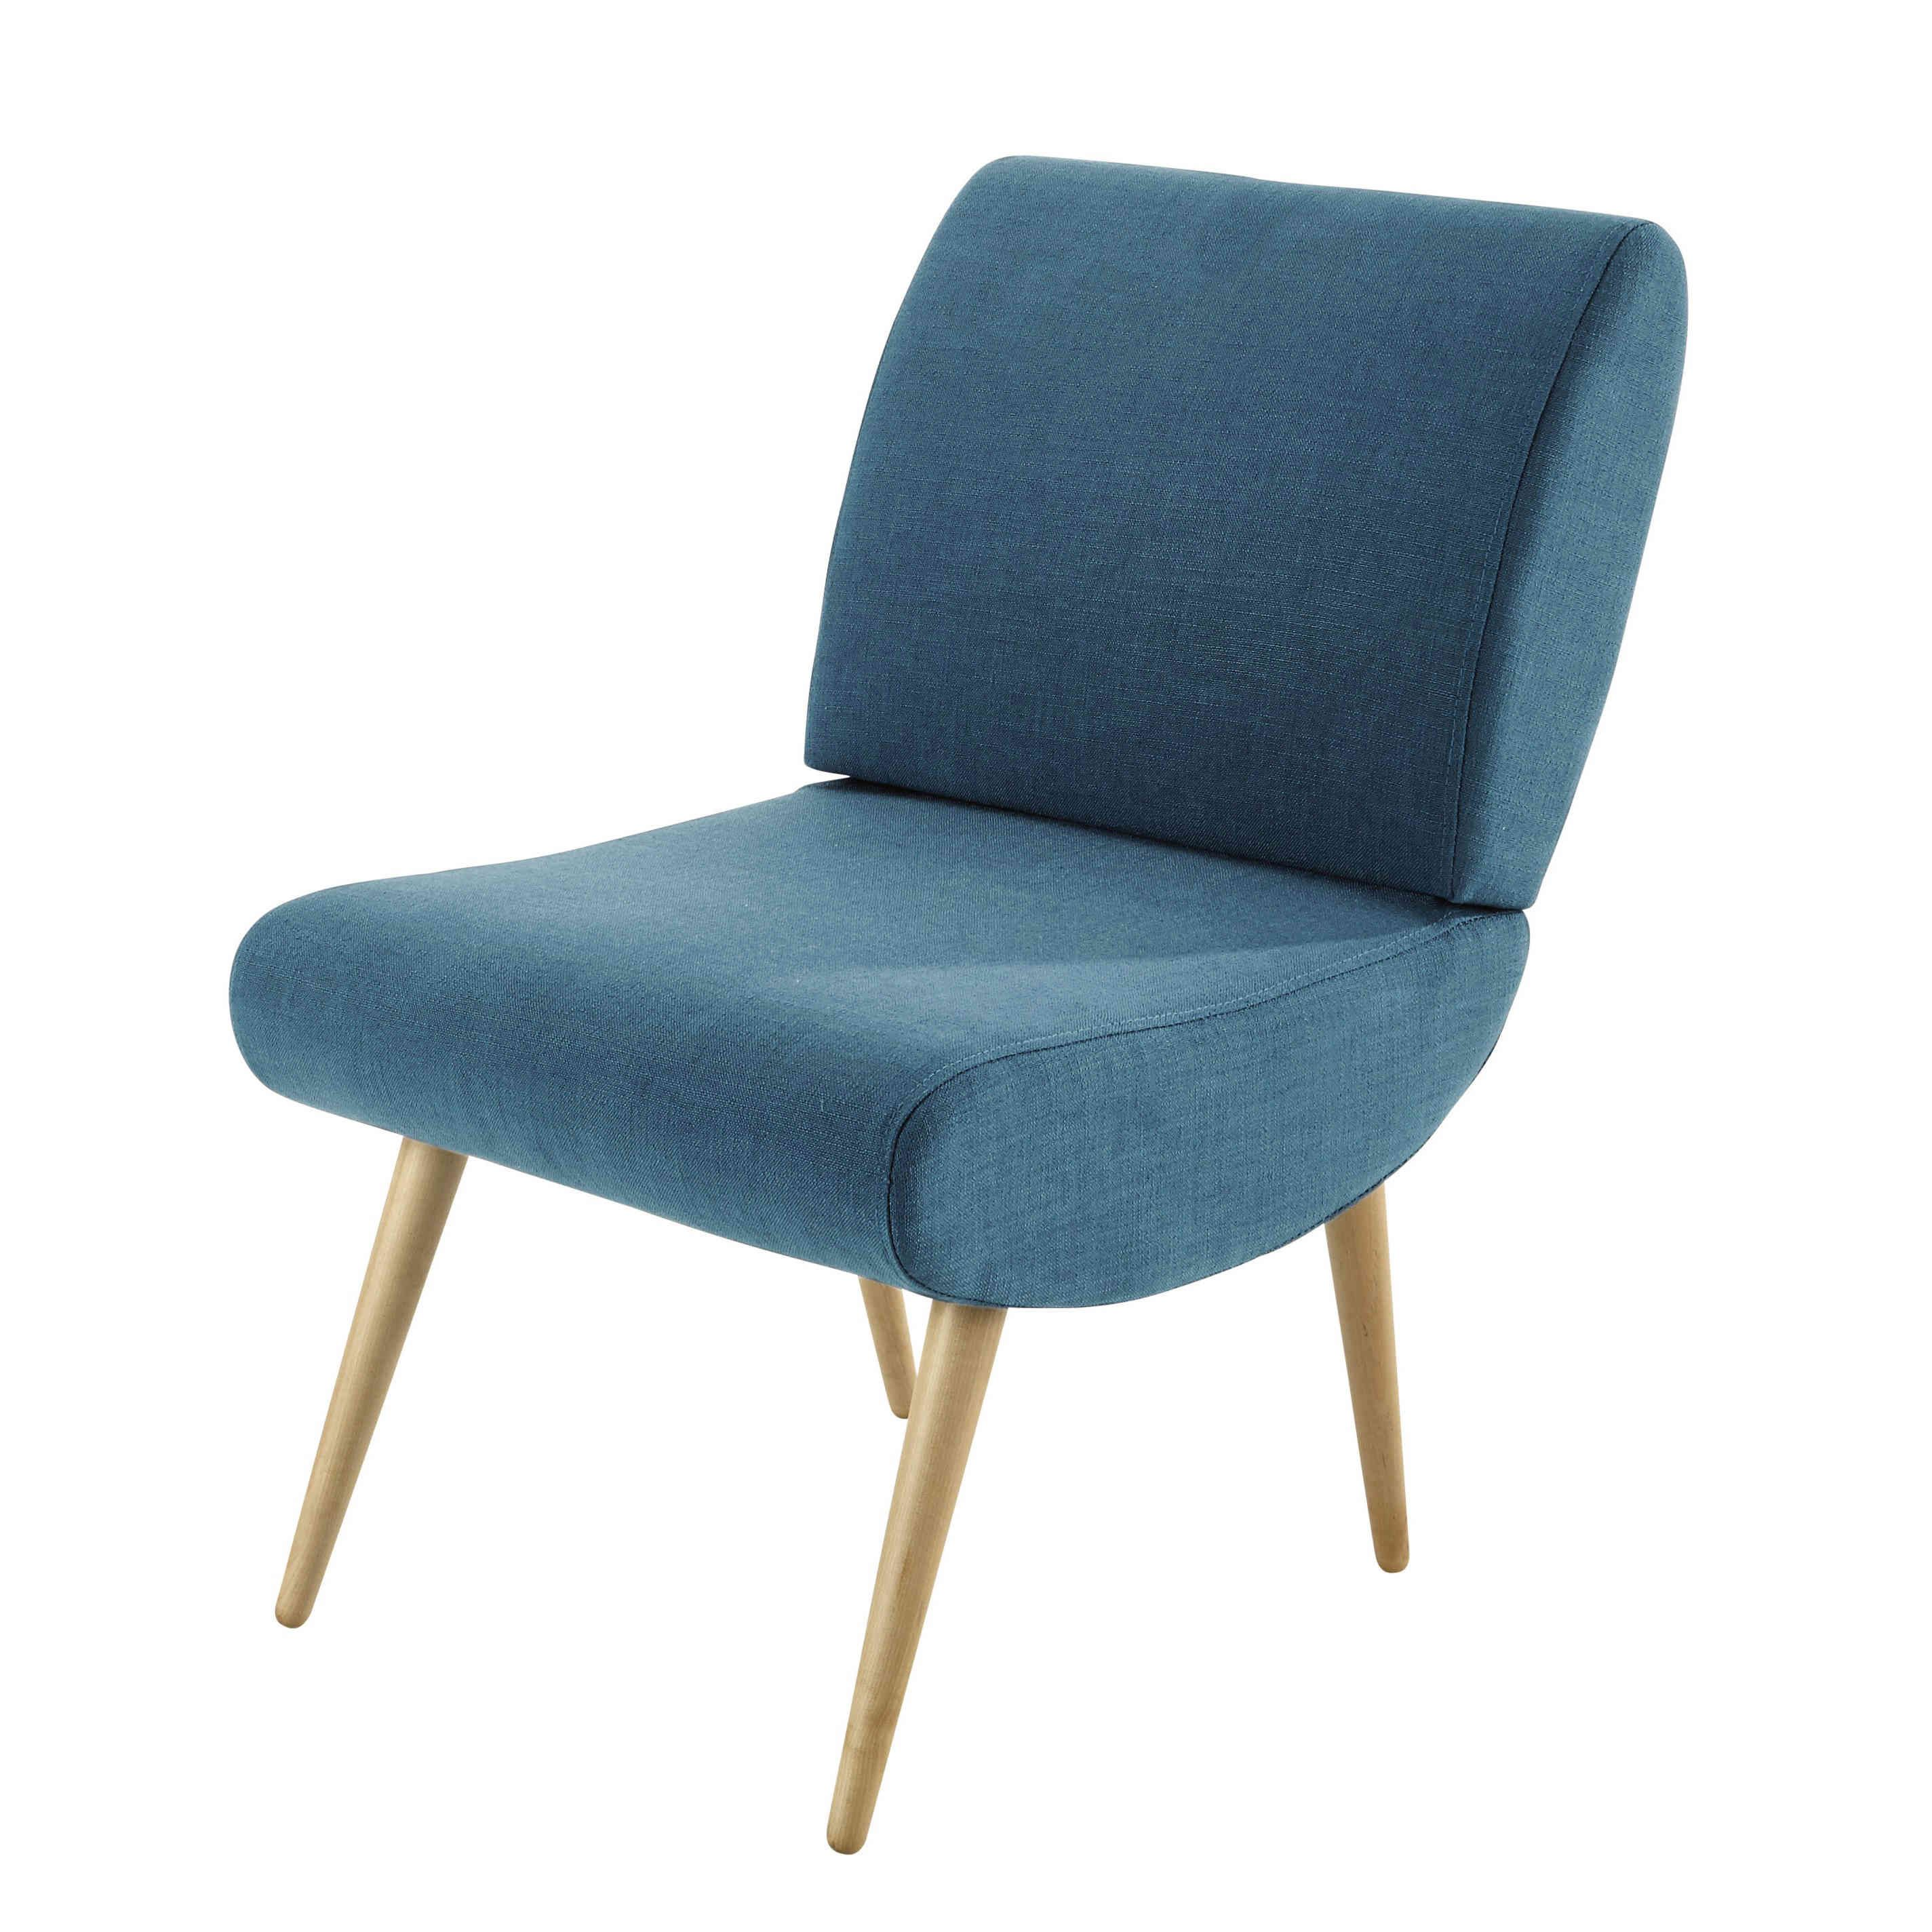 Stoffsessel im vintage stil entenblau wohnzimmer for Wohnzimmer sessel vintage